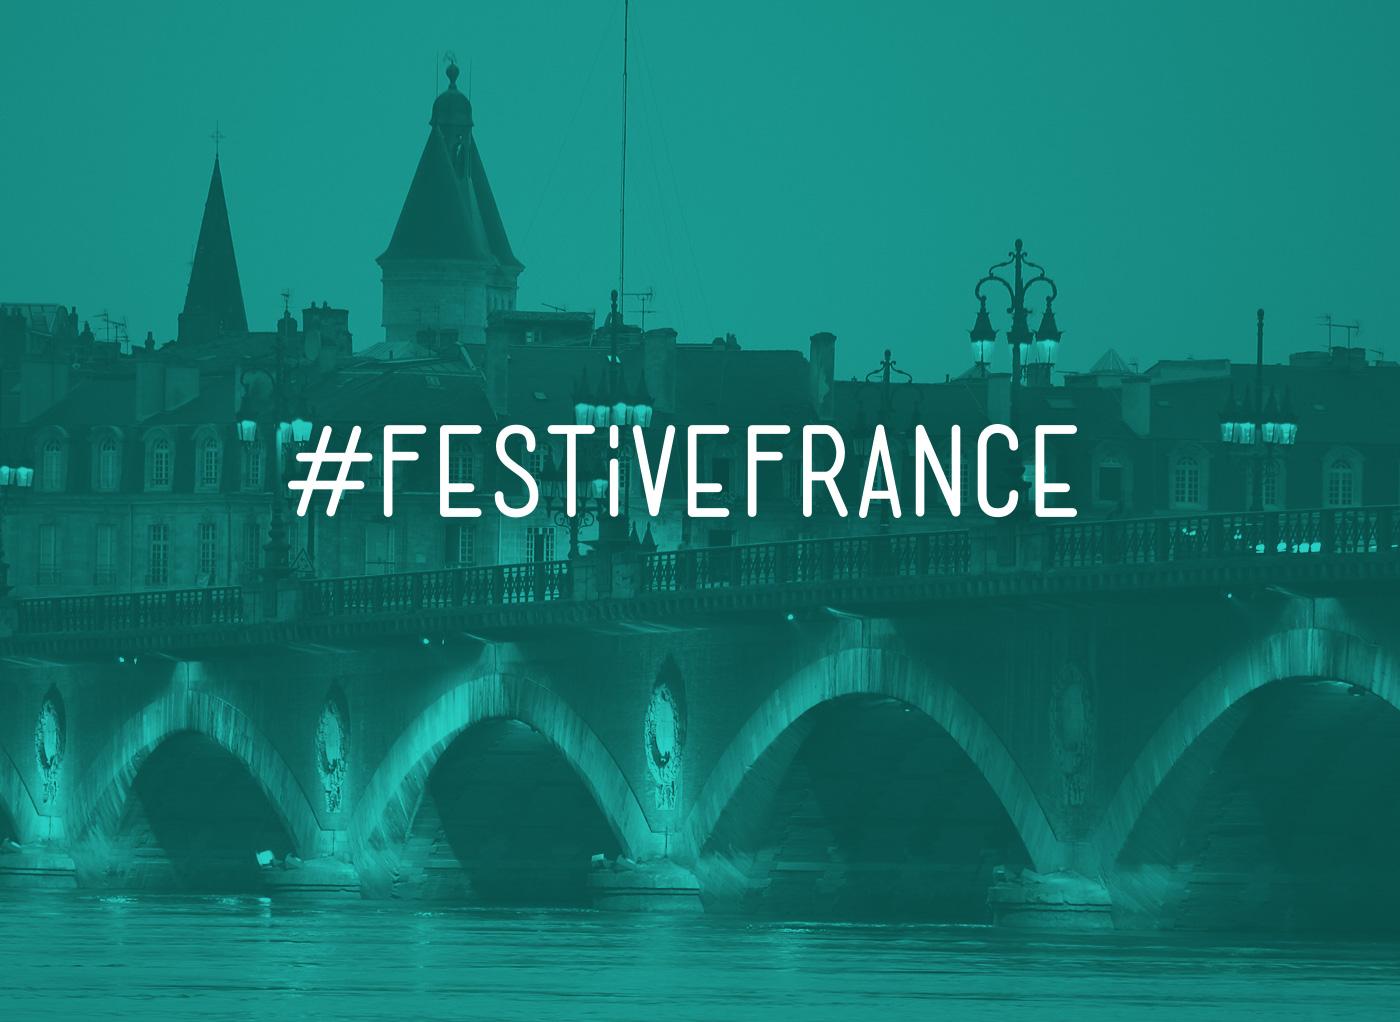 Festive France Hashtag Type design